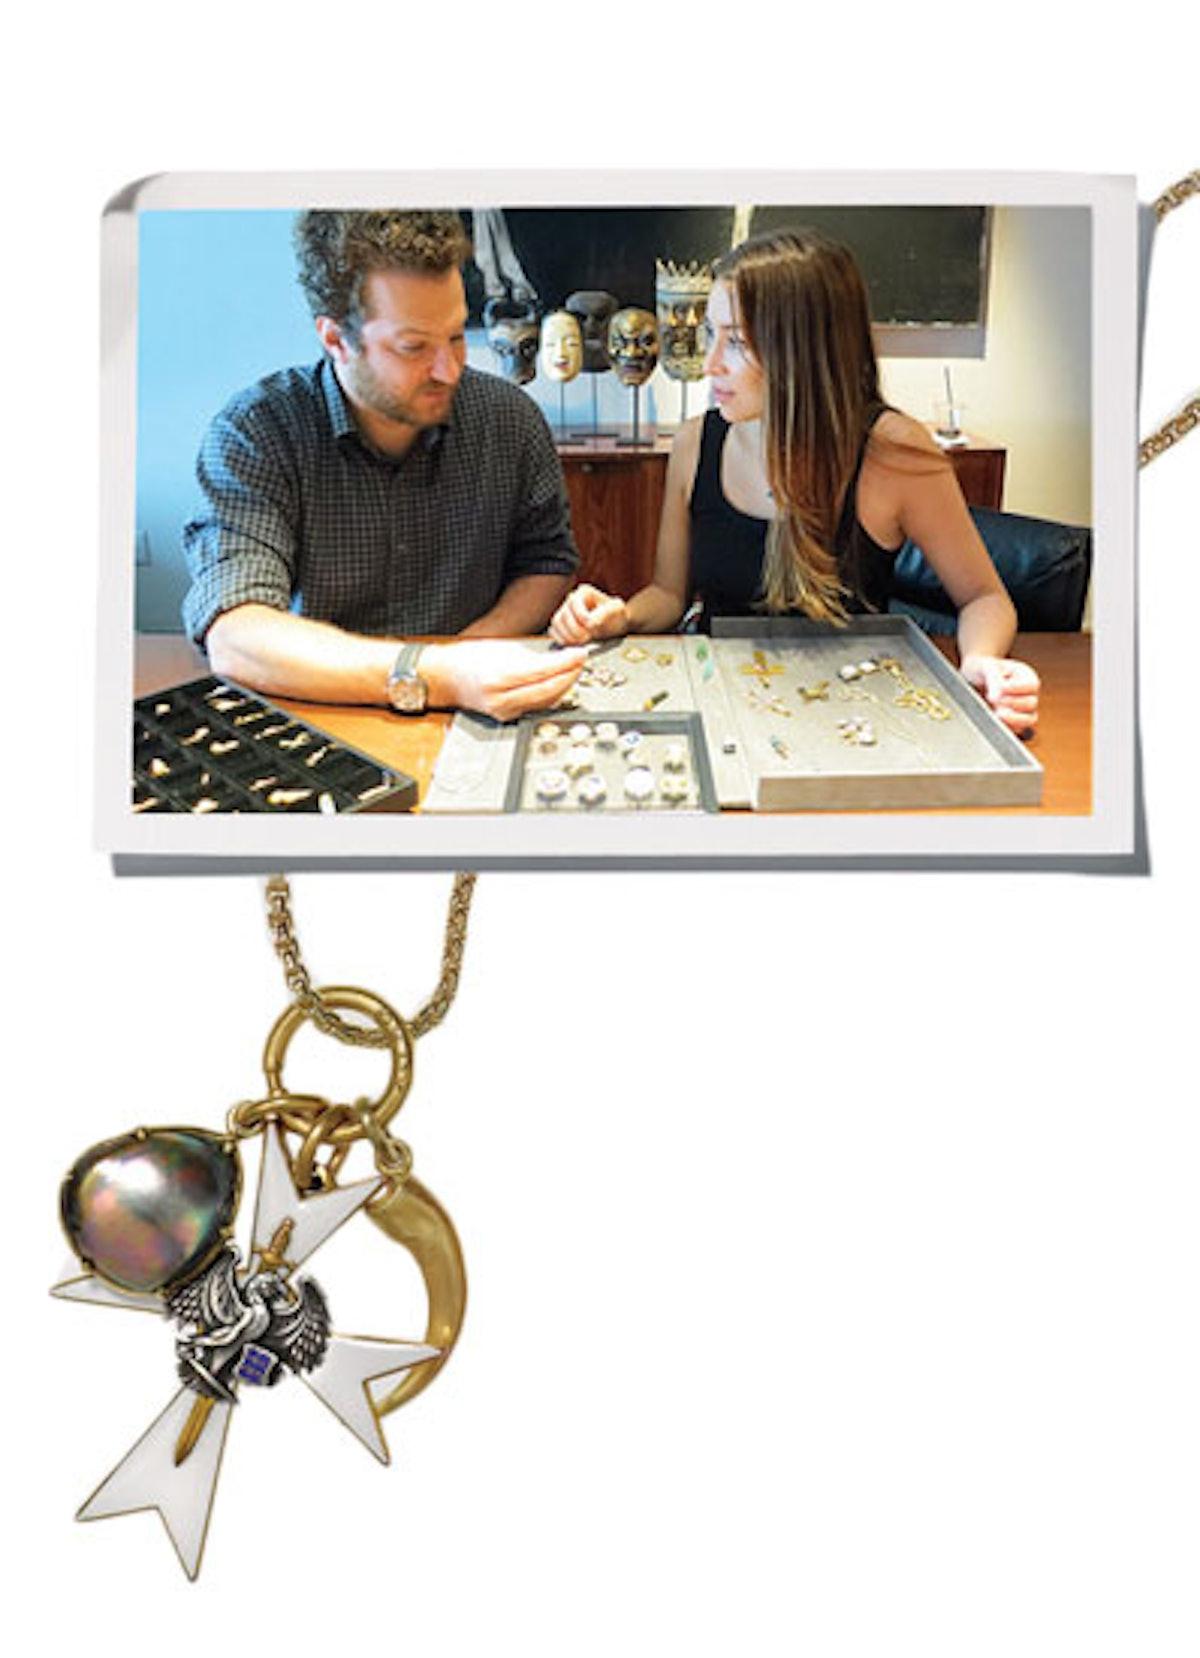 acss-claudia-mata-jewelry-picks-sept-2012-06-v.jpg